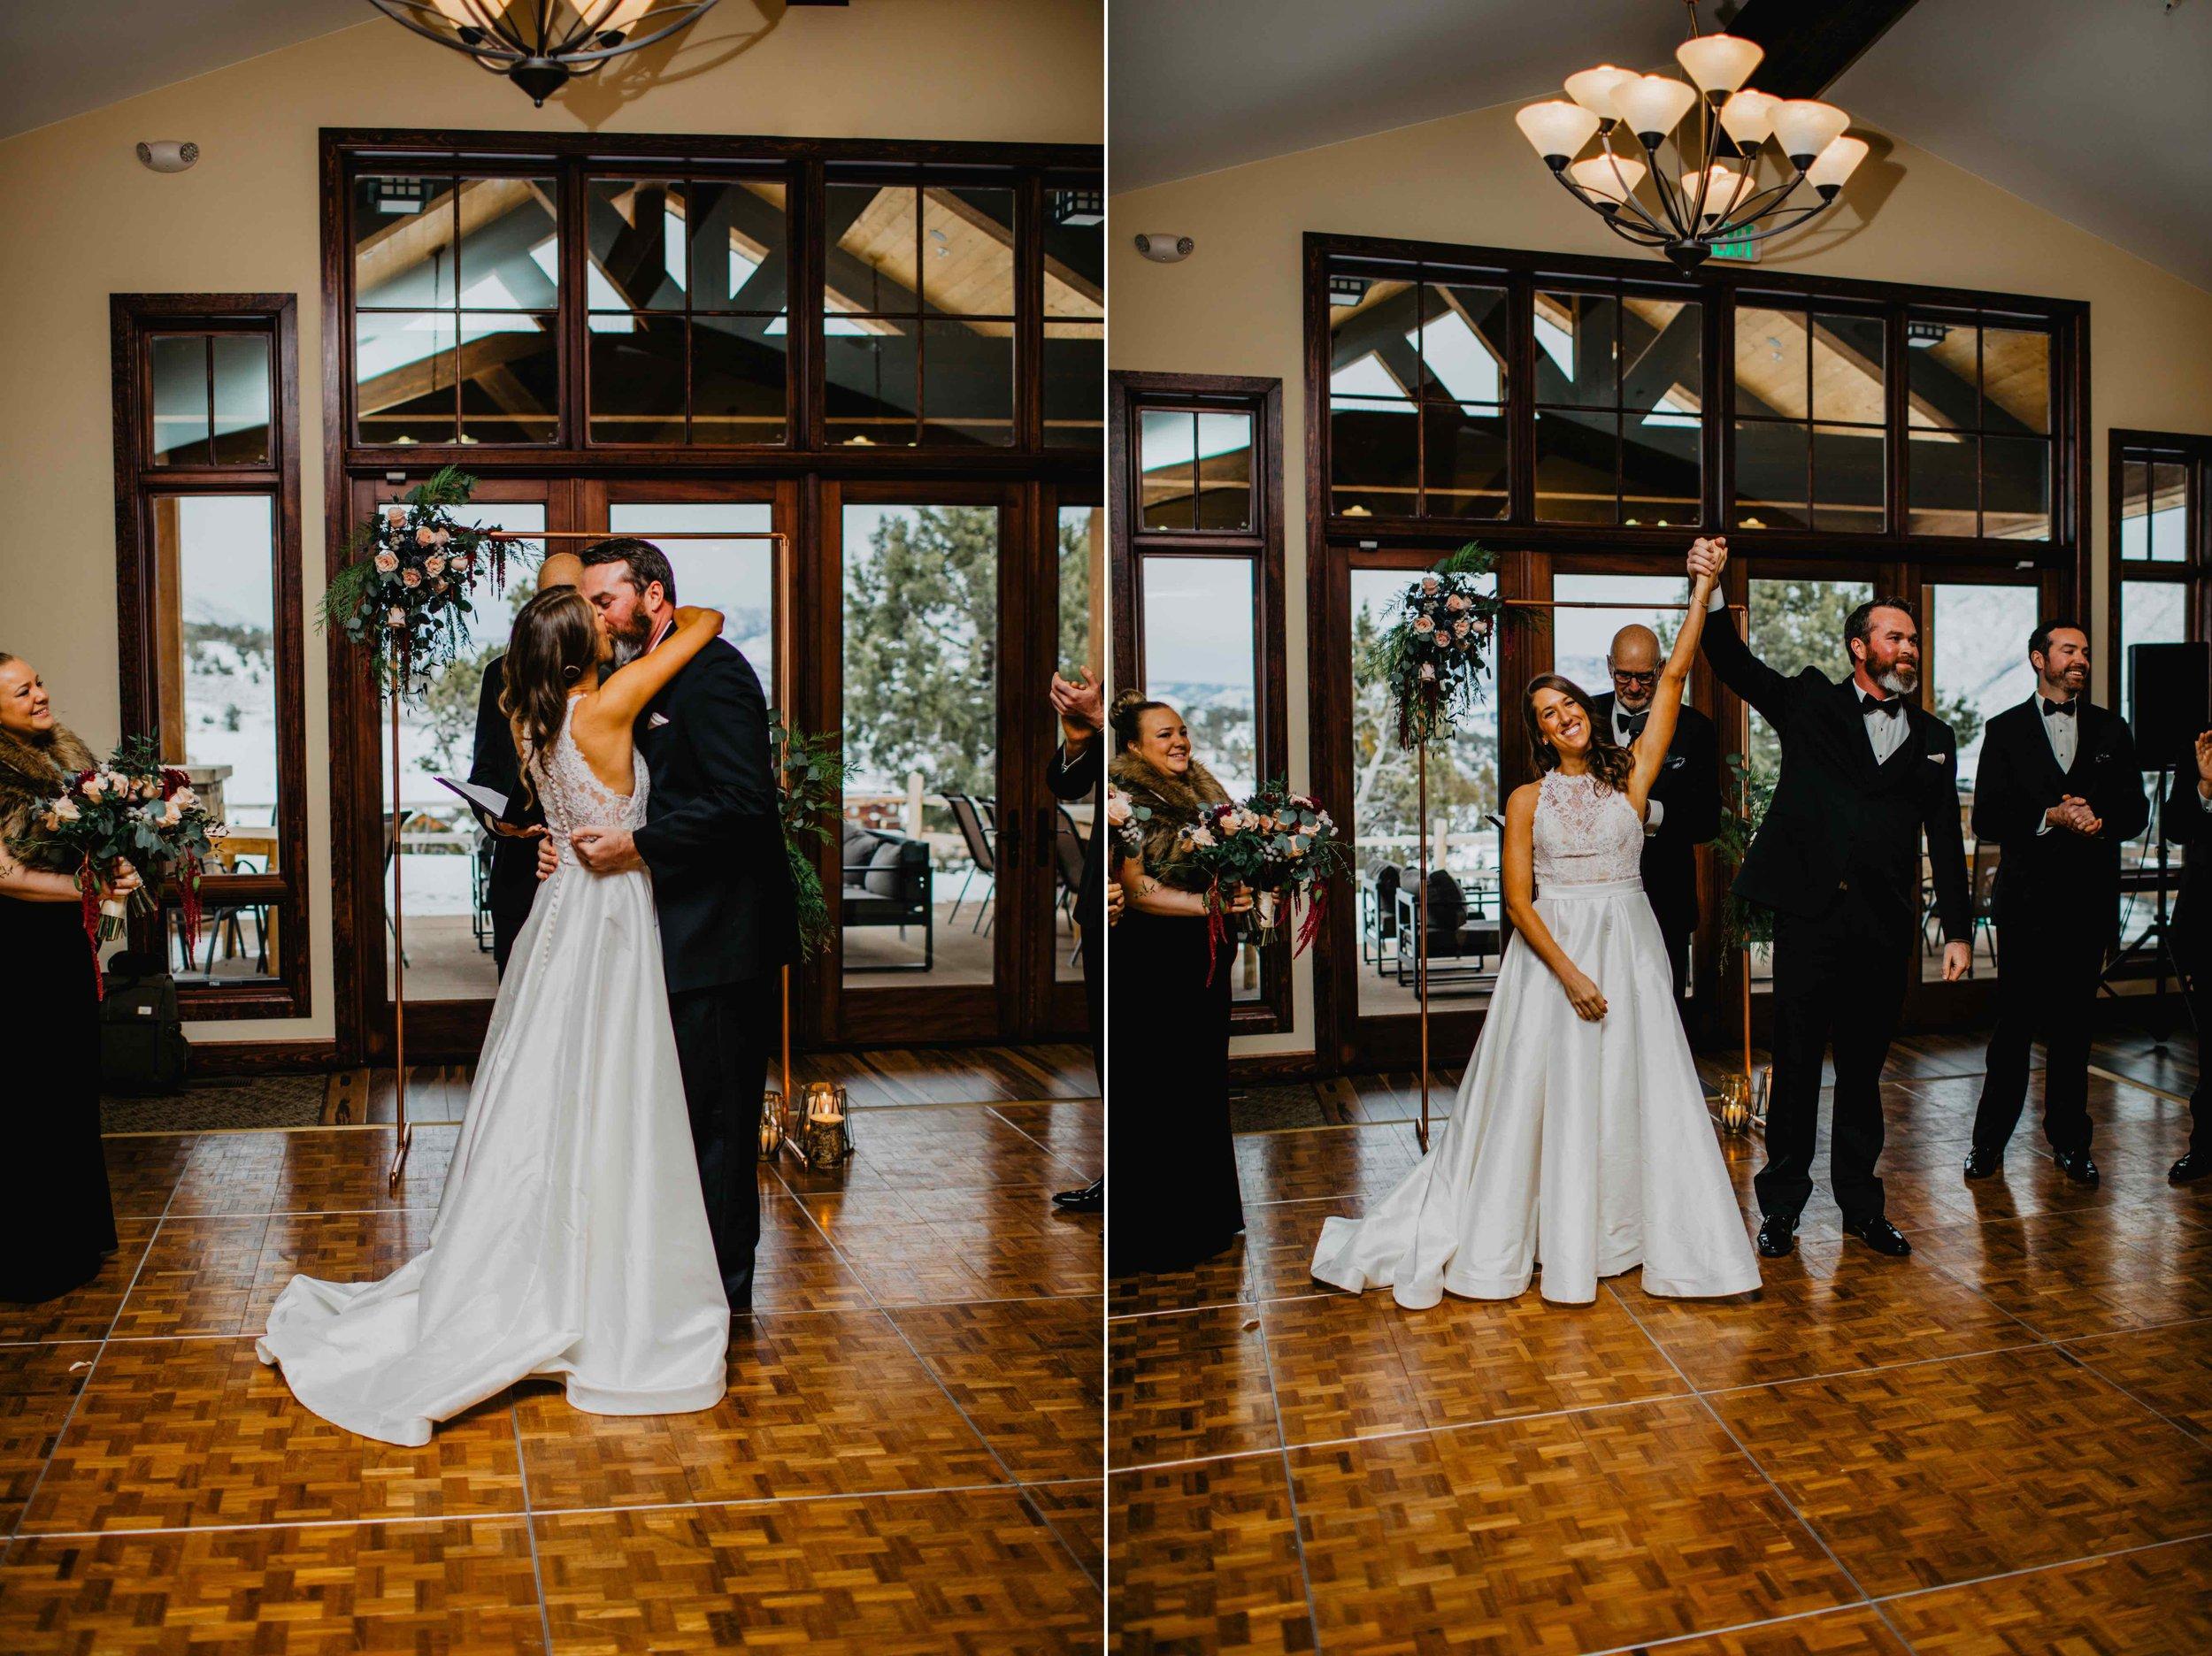 Kisa Conrad Favorites-0006-colorado-wedding-photographer-denver-springs-vailhotel-glenwood-springs-colorado-wedding-photographer.jpeg